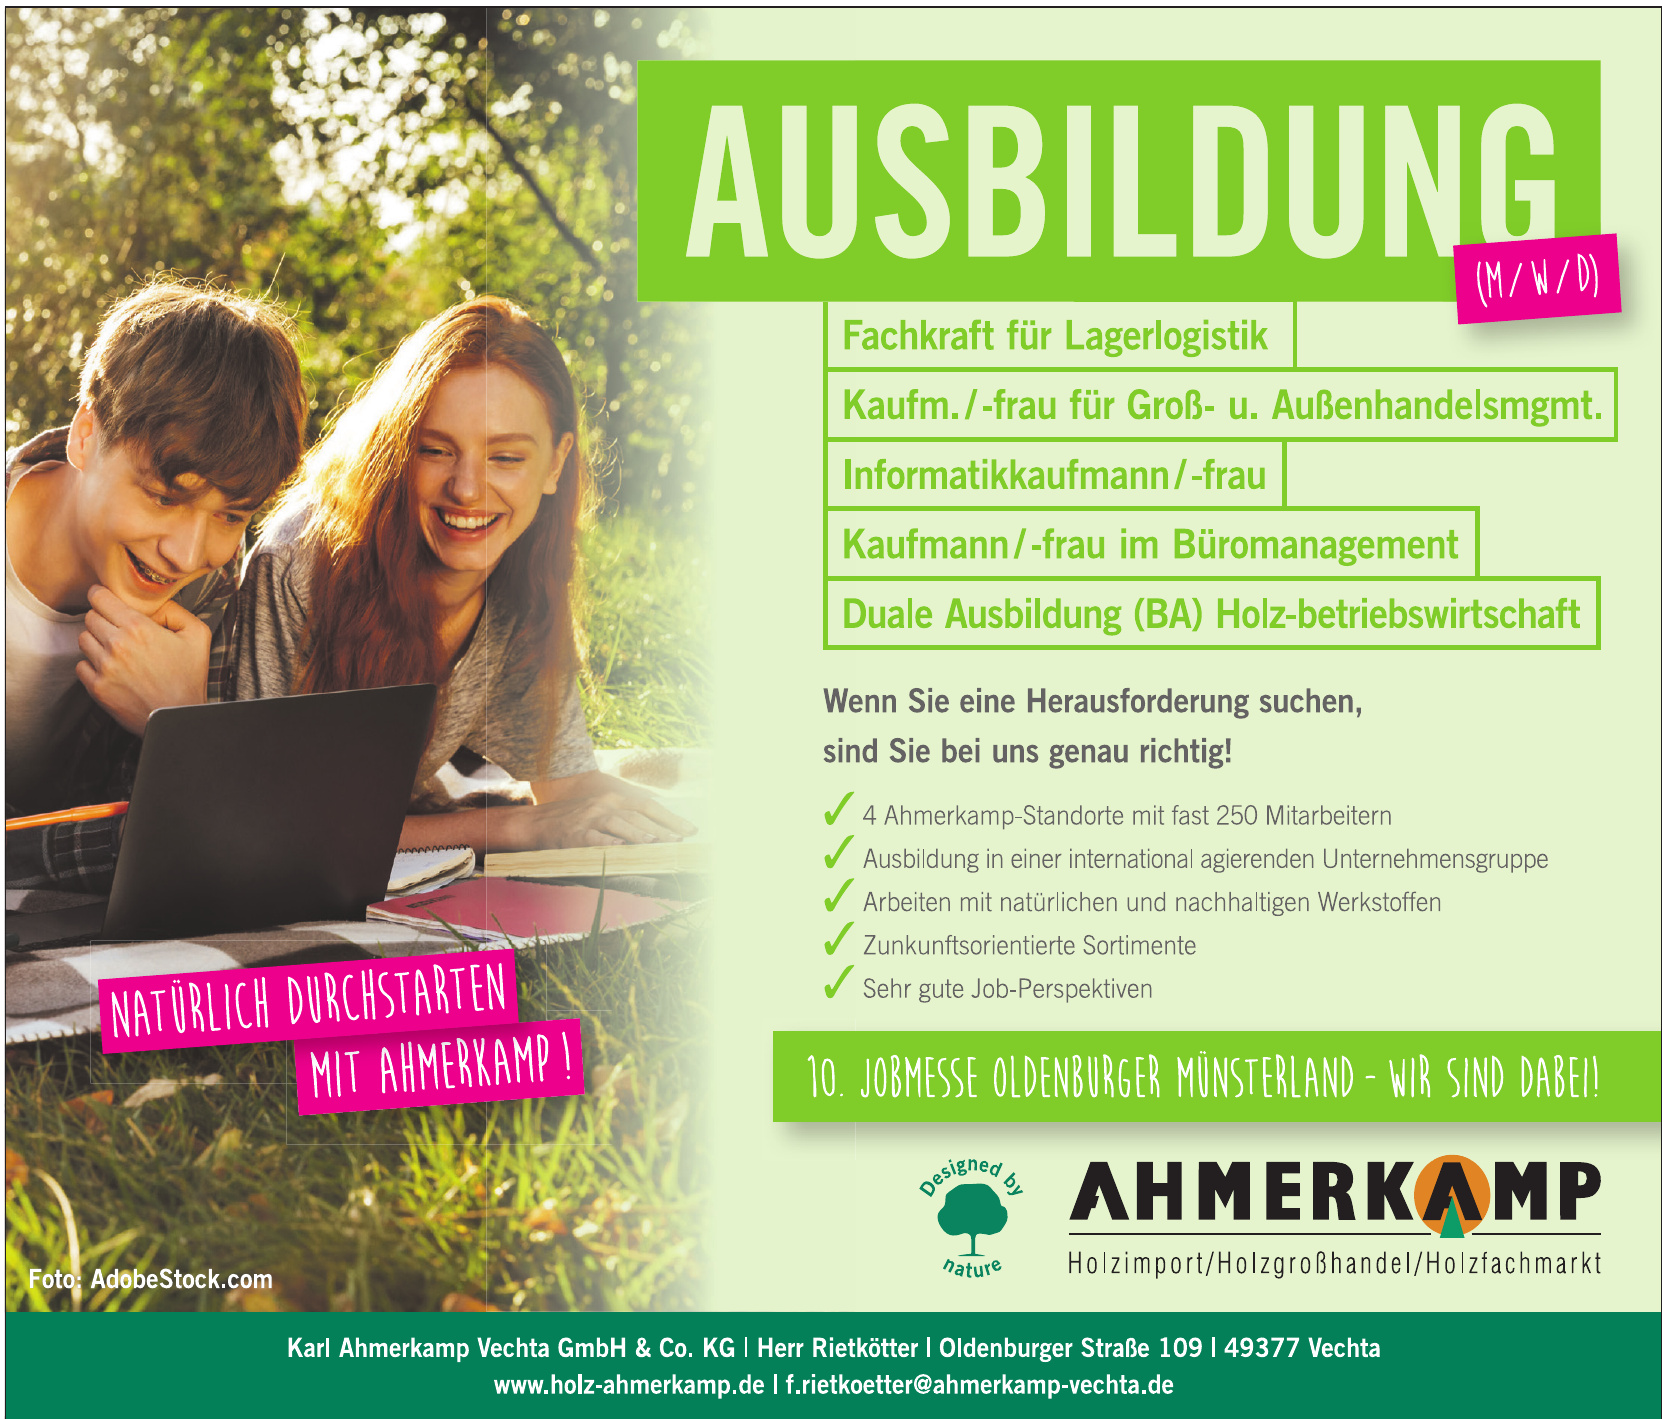 Karl Ahmerkamp Vechta GmbH & Co. KG